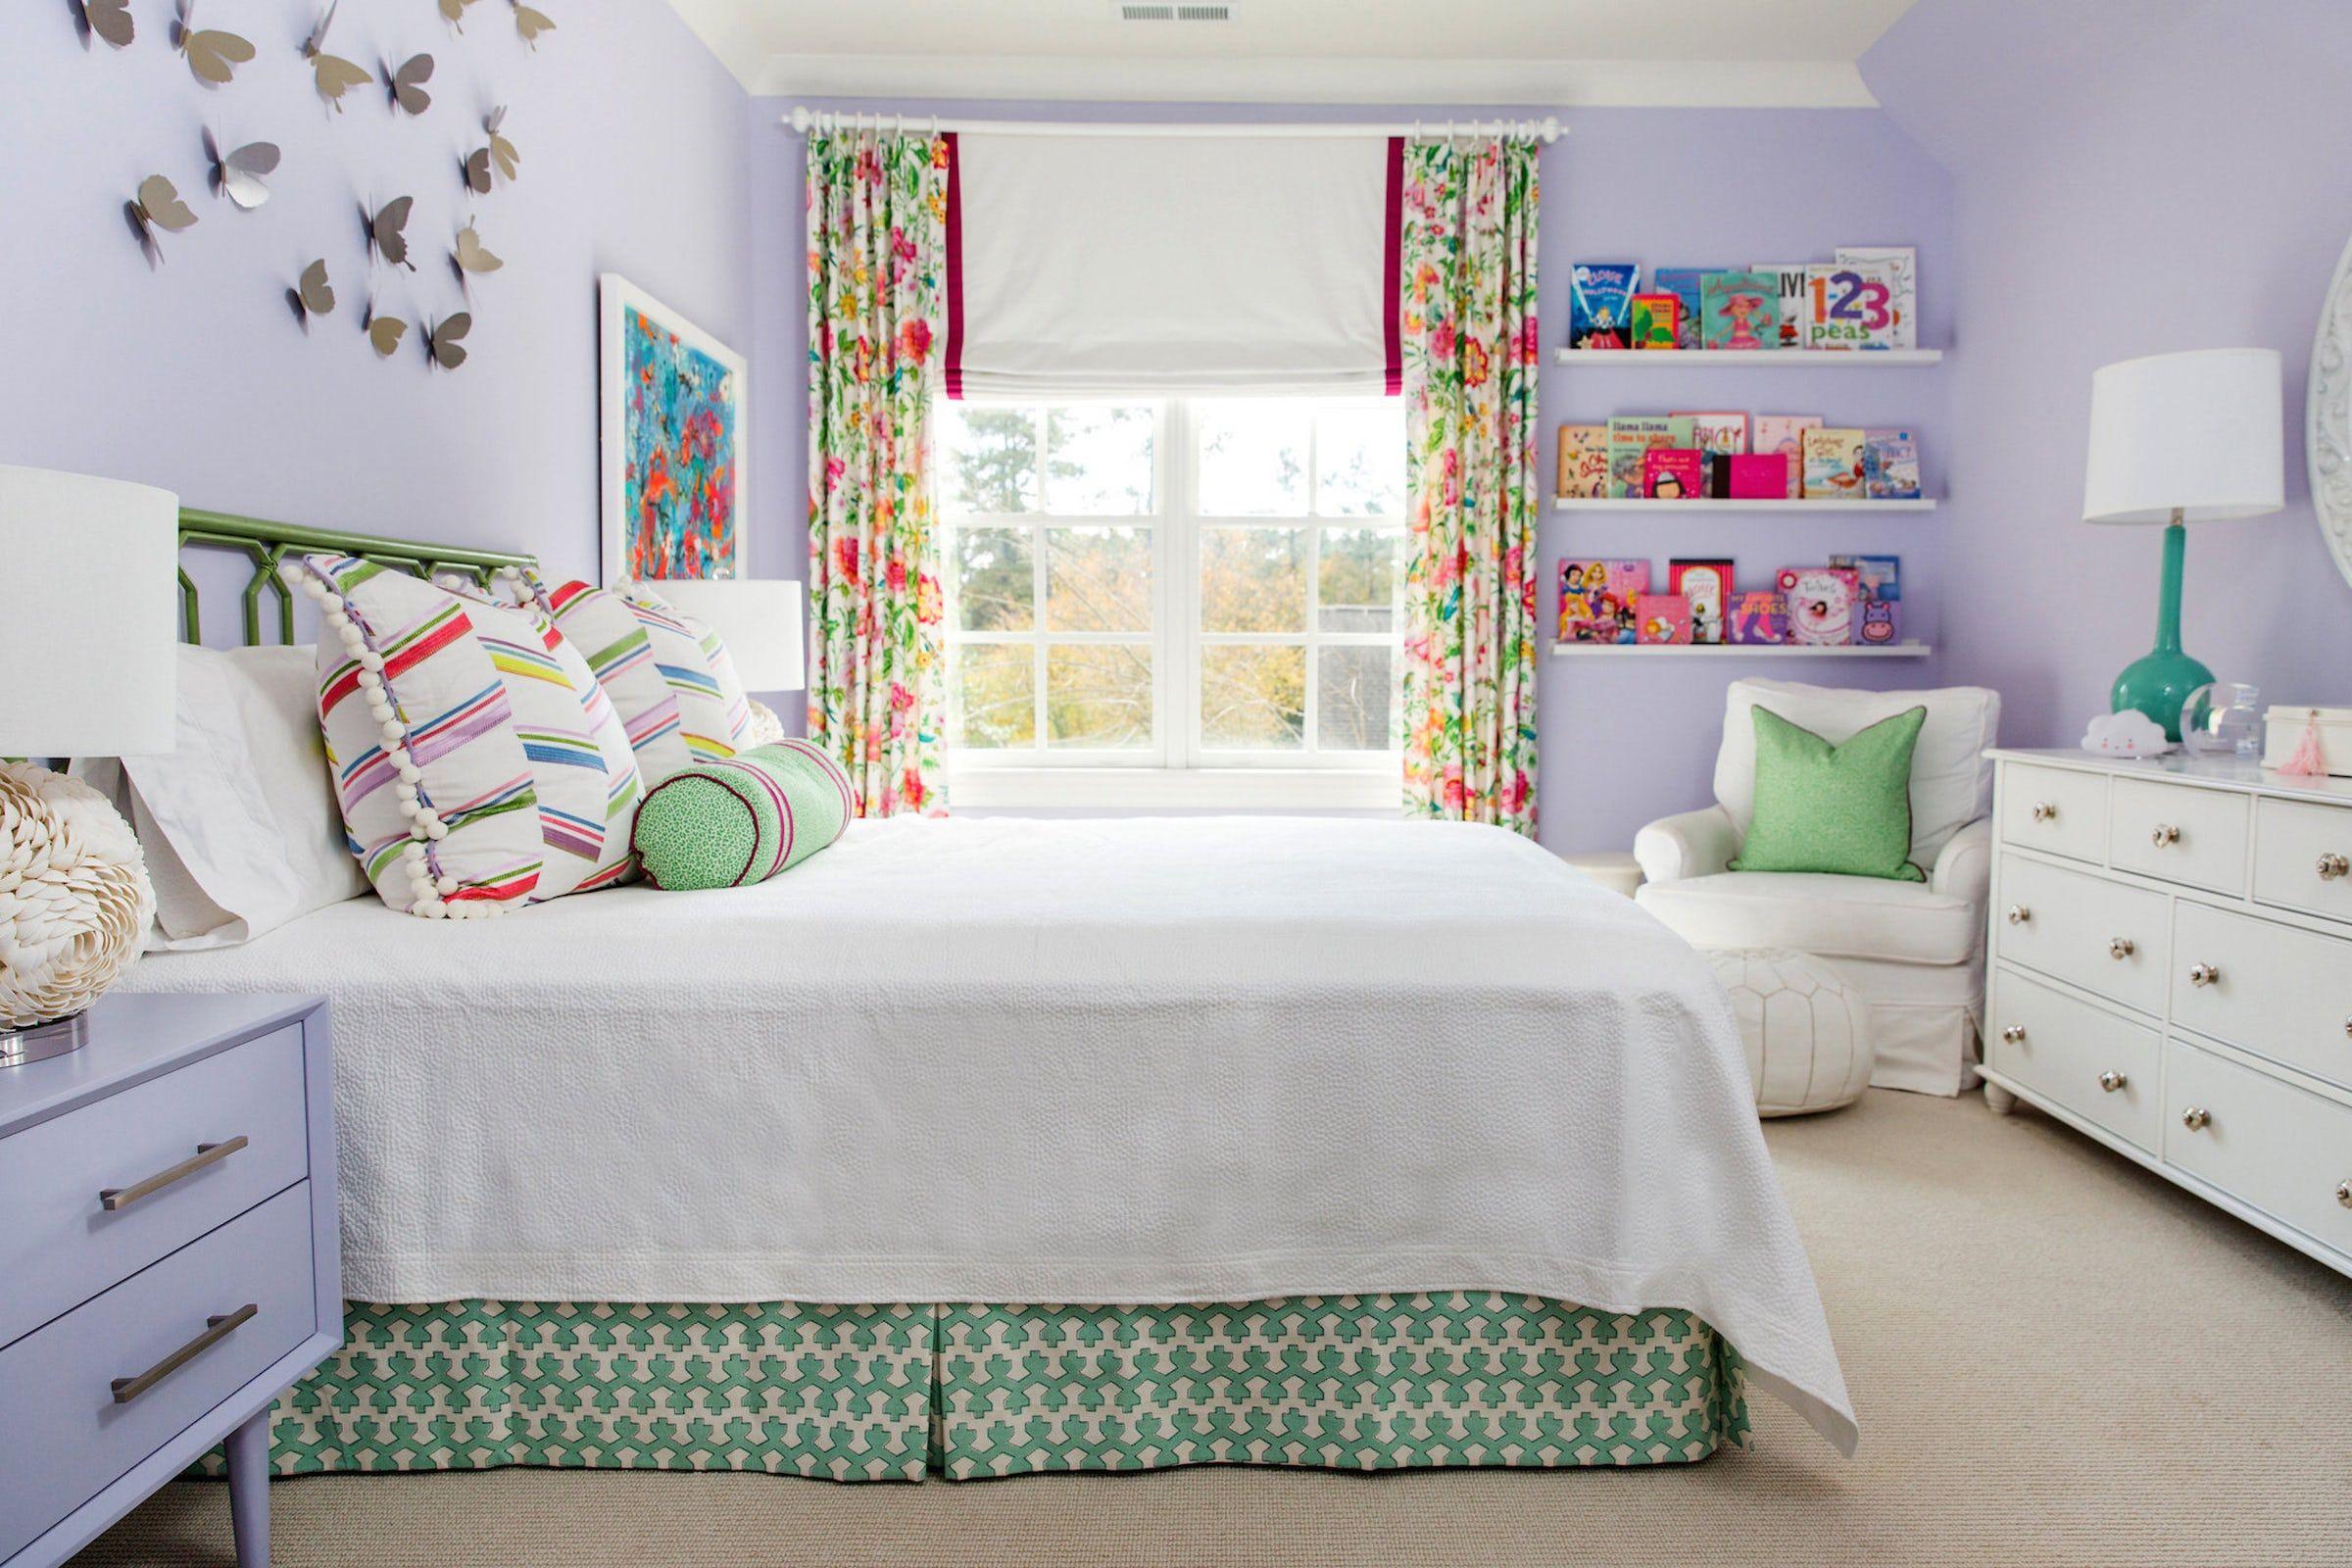 15 creative girls room ideas how to decorate a girl s bedroom rh elledecor com